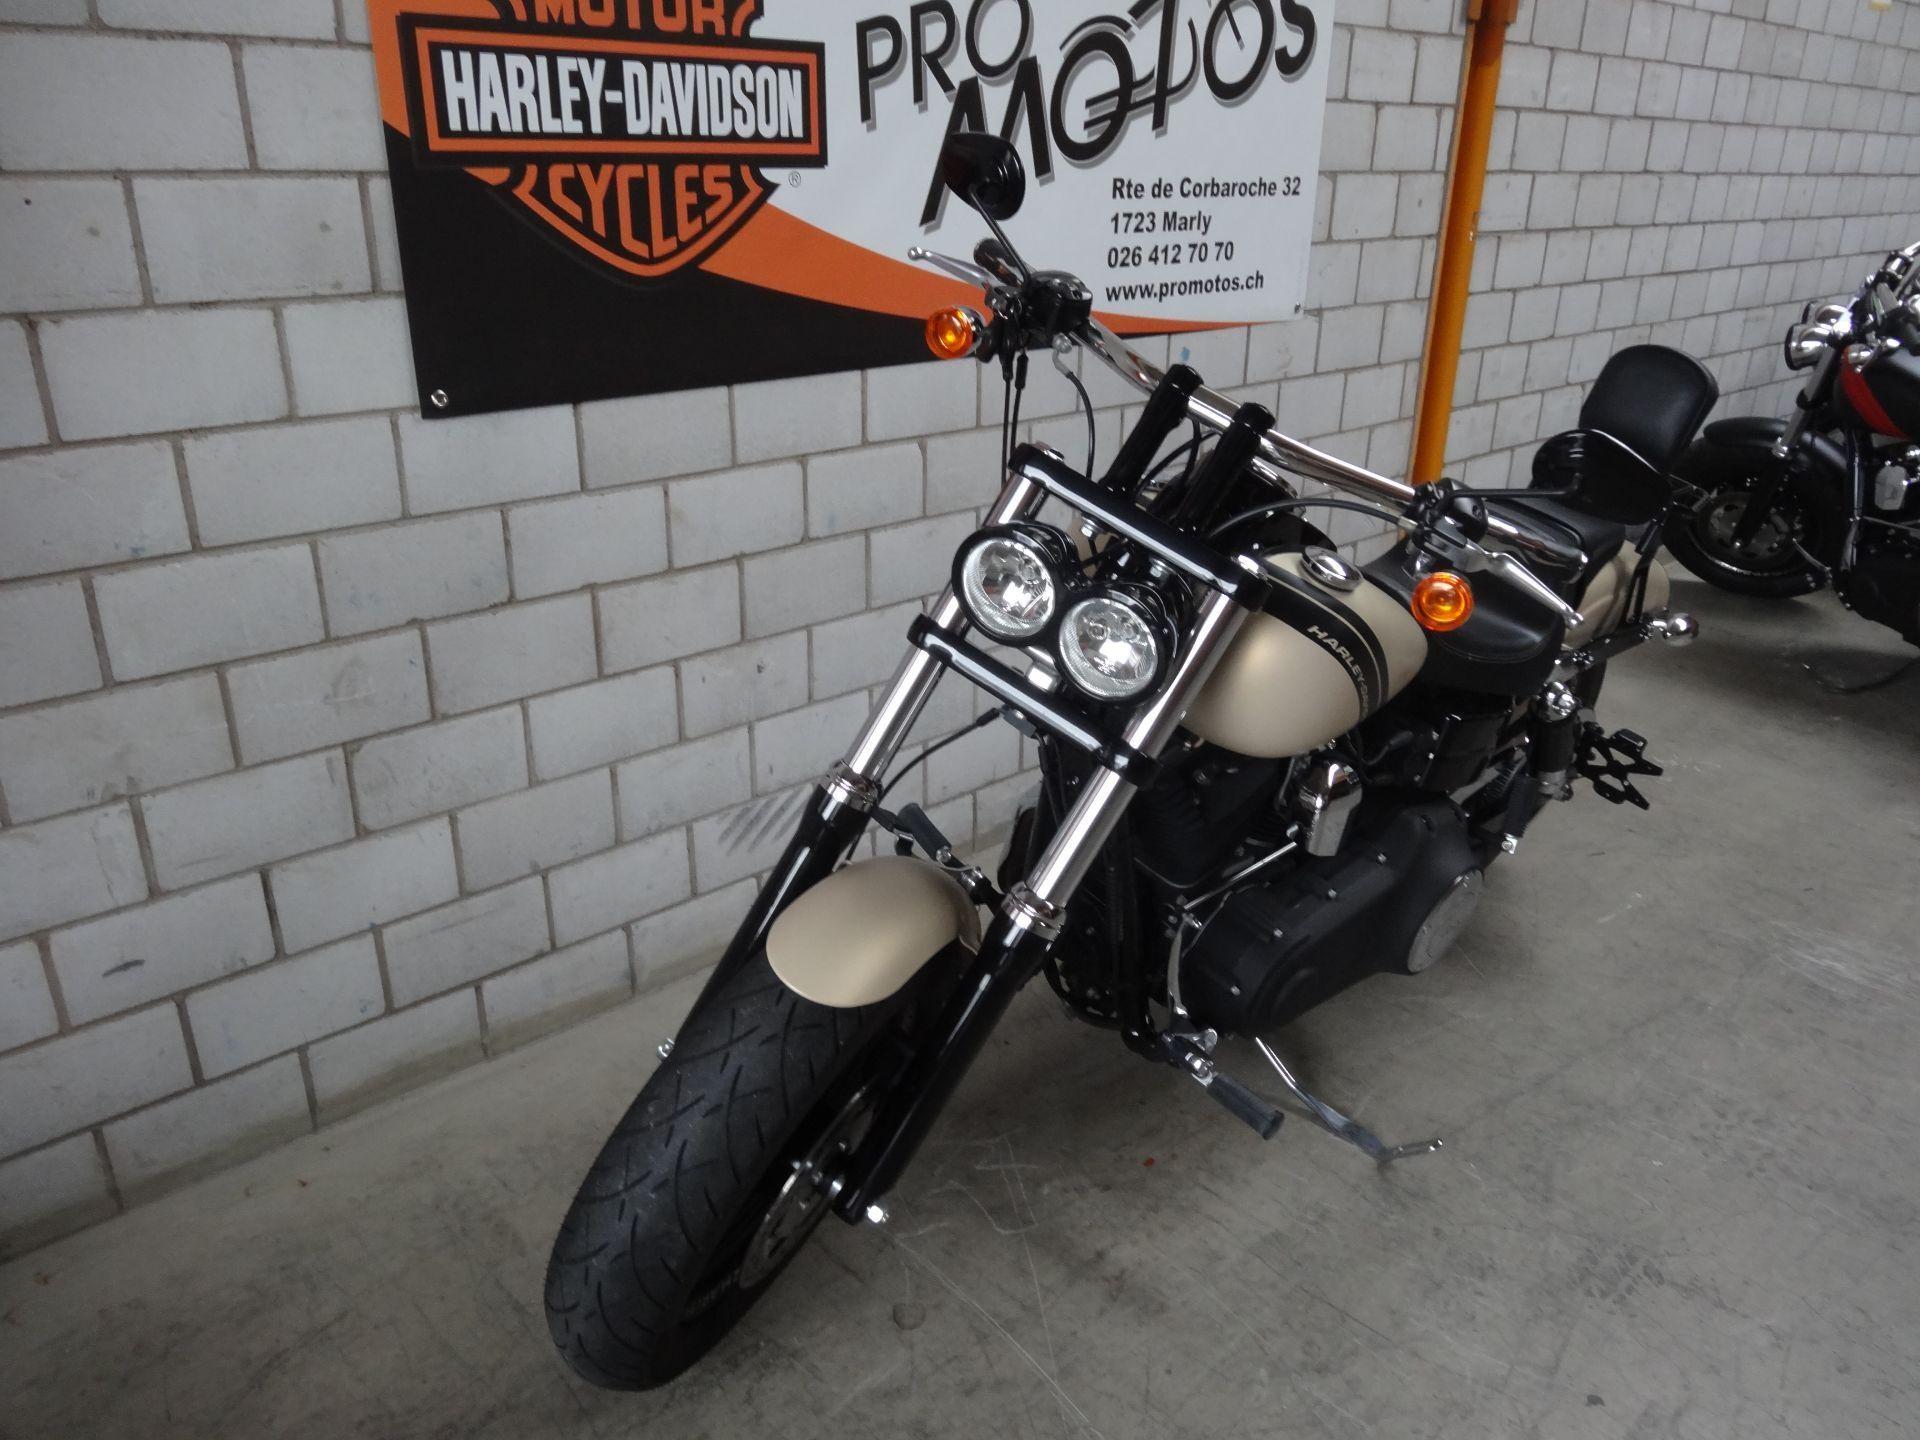 motorrad occasion kaufen harley davidson fxdf 1690 dyna fat bob abs pro motos sa marly. Black Bedroom Furniture Sets. Home Design Ideas